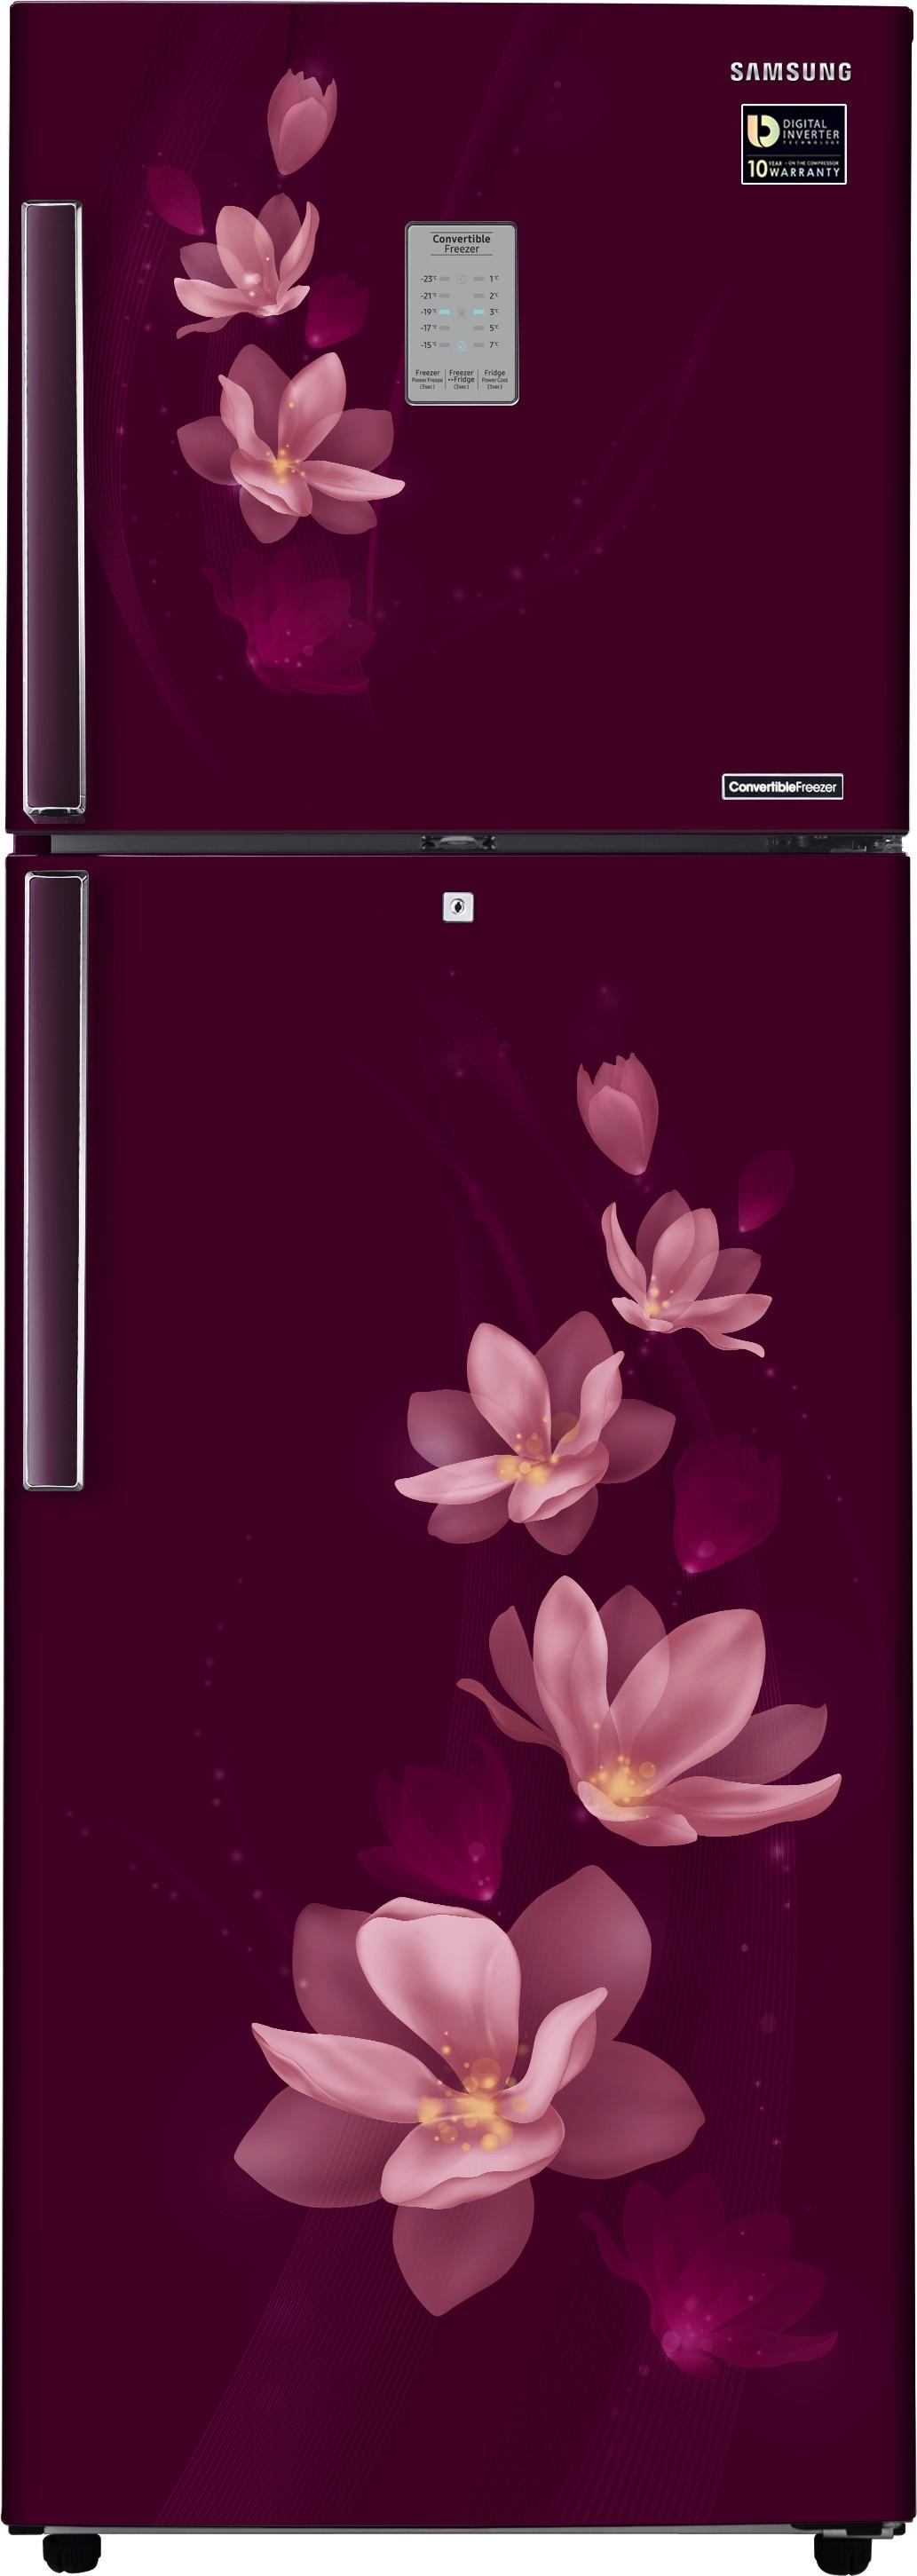 SAMSUNG 321 L Frost Free Double Door Refrigerator(RT34M3954R7/HL, Magnolia Plum, 2017) (Samsung) Tamil Nadu Buy Online